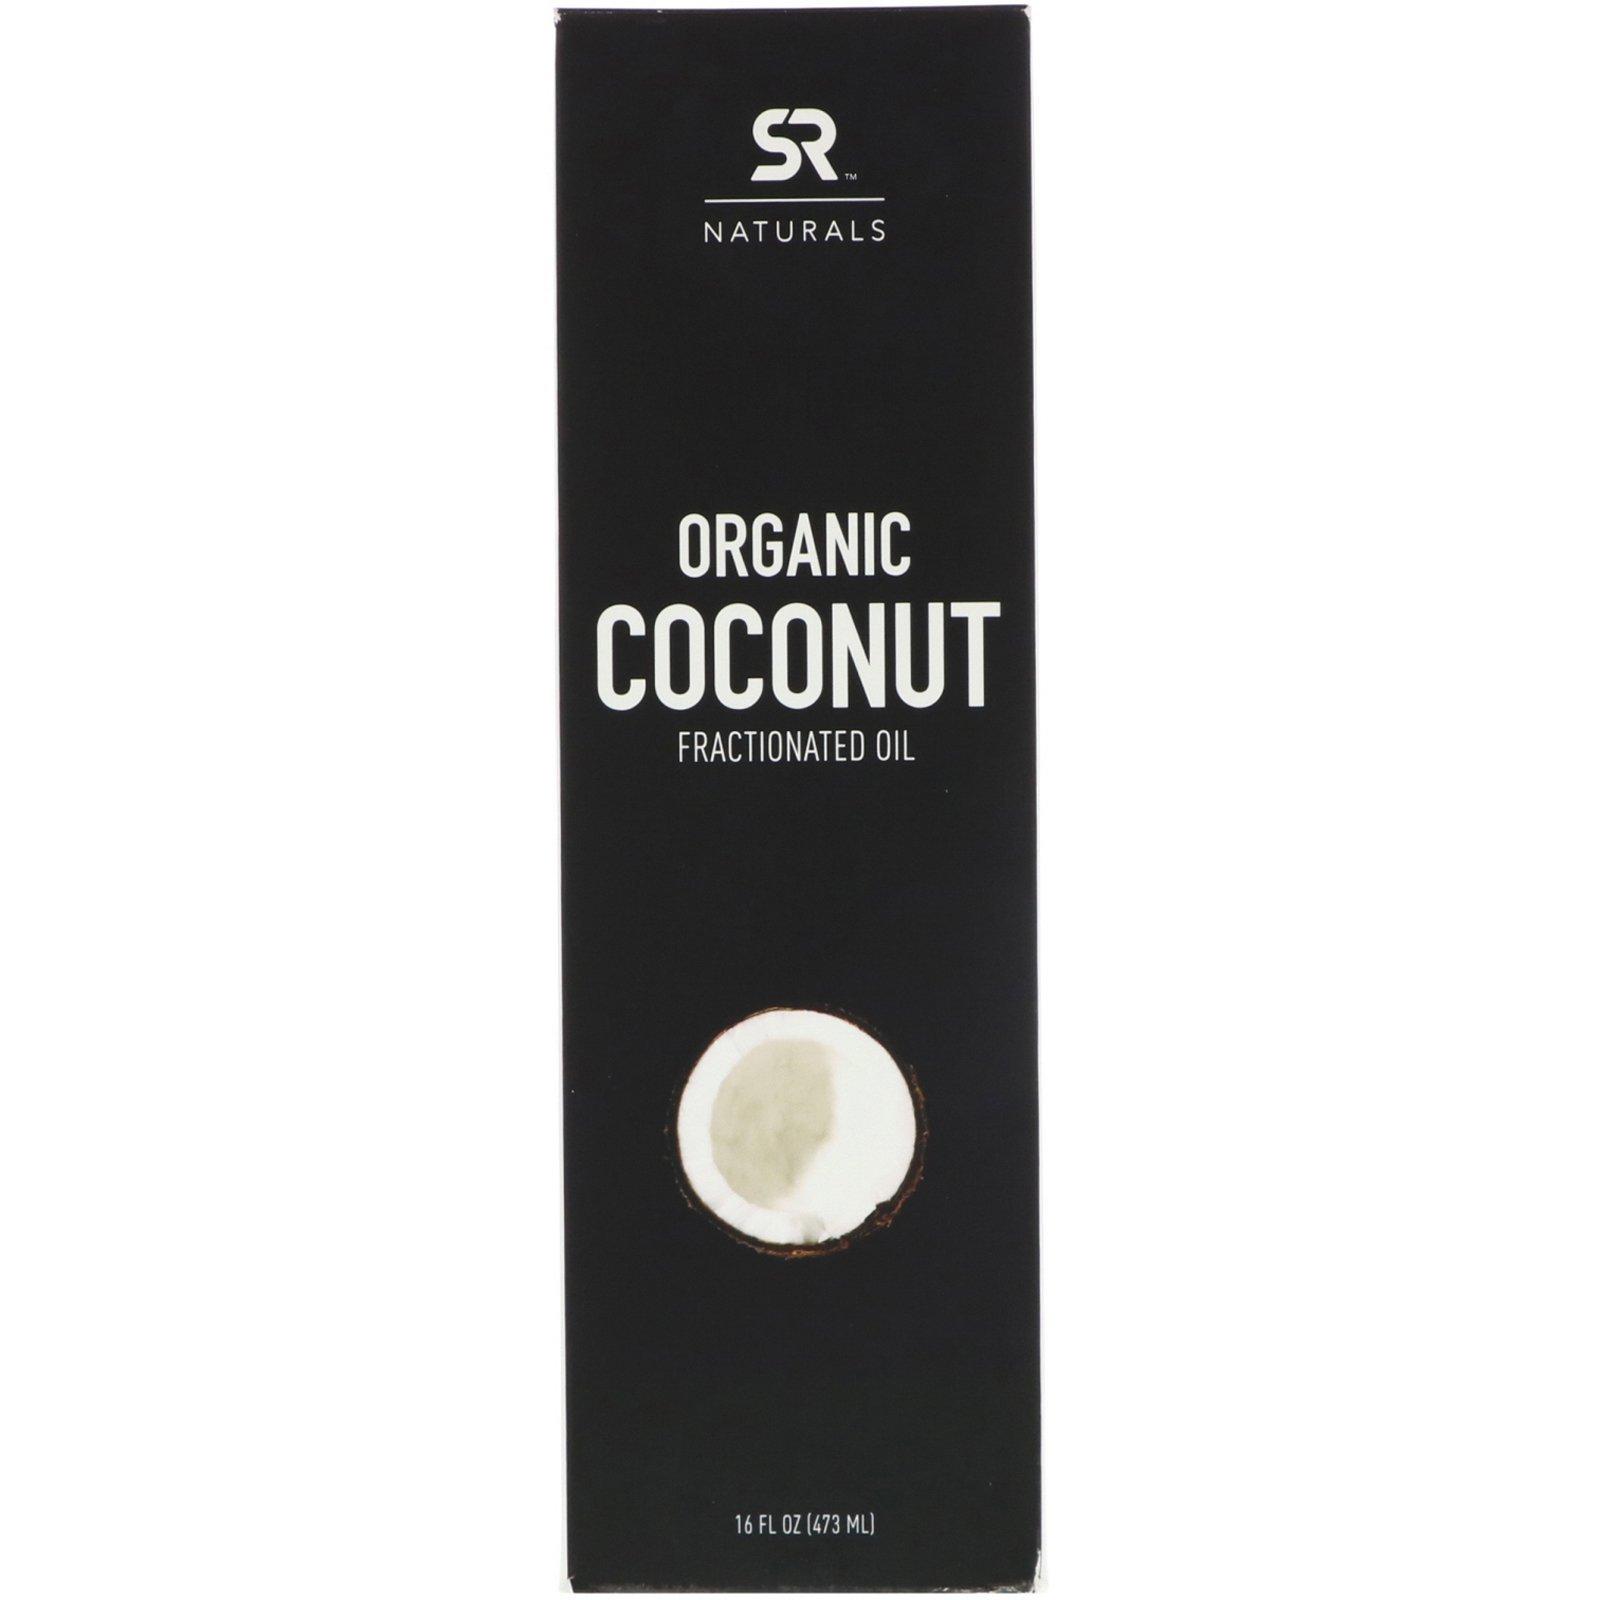 sports-research-organicheskoe-kokosovoe-maslo-473-ml-16-fl-oz-1